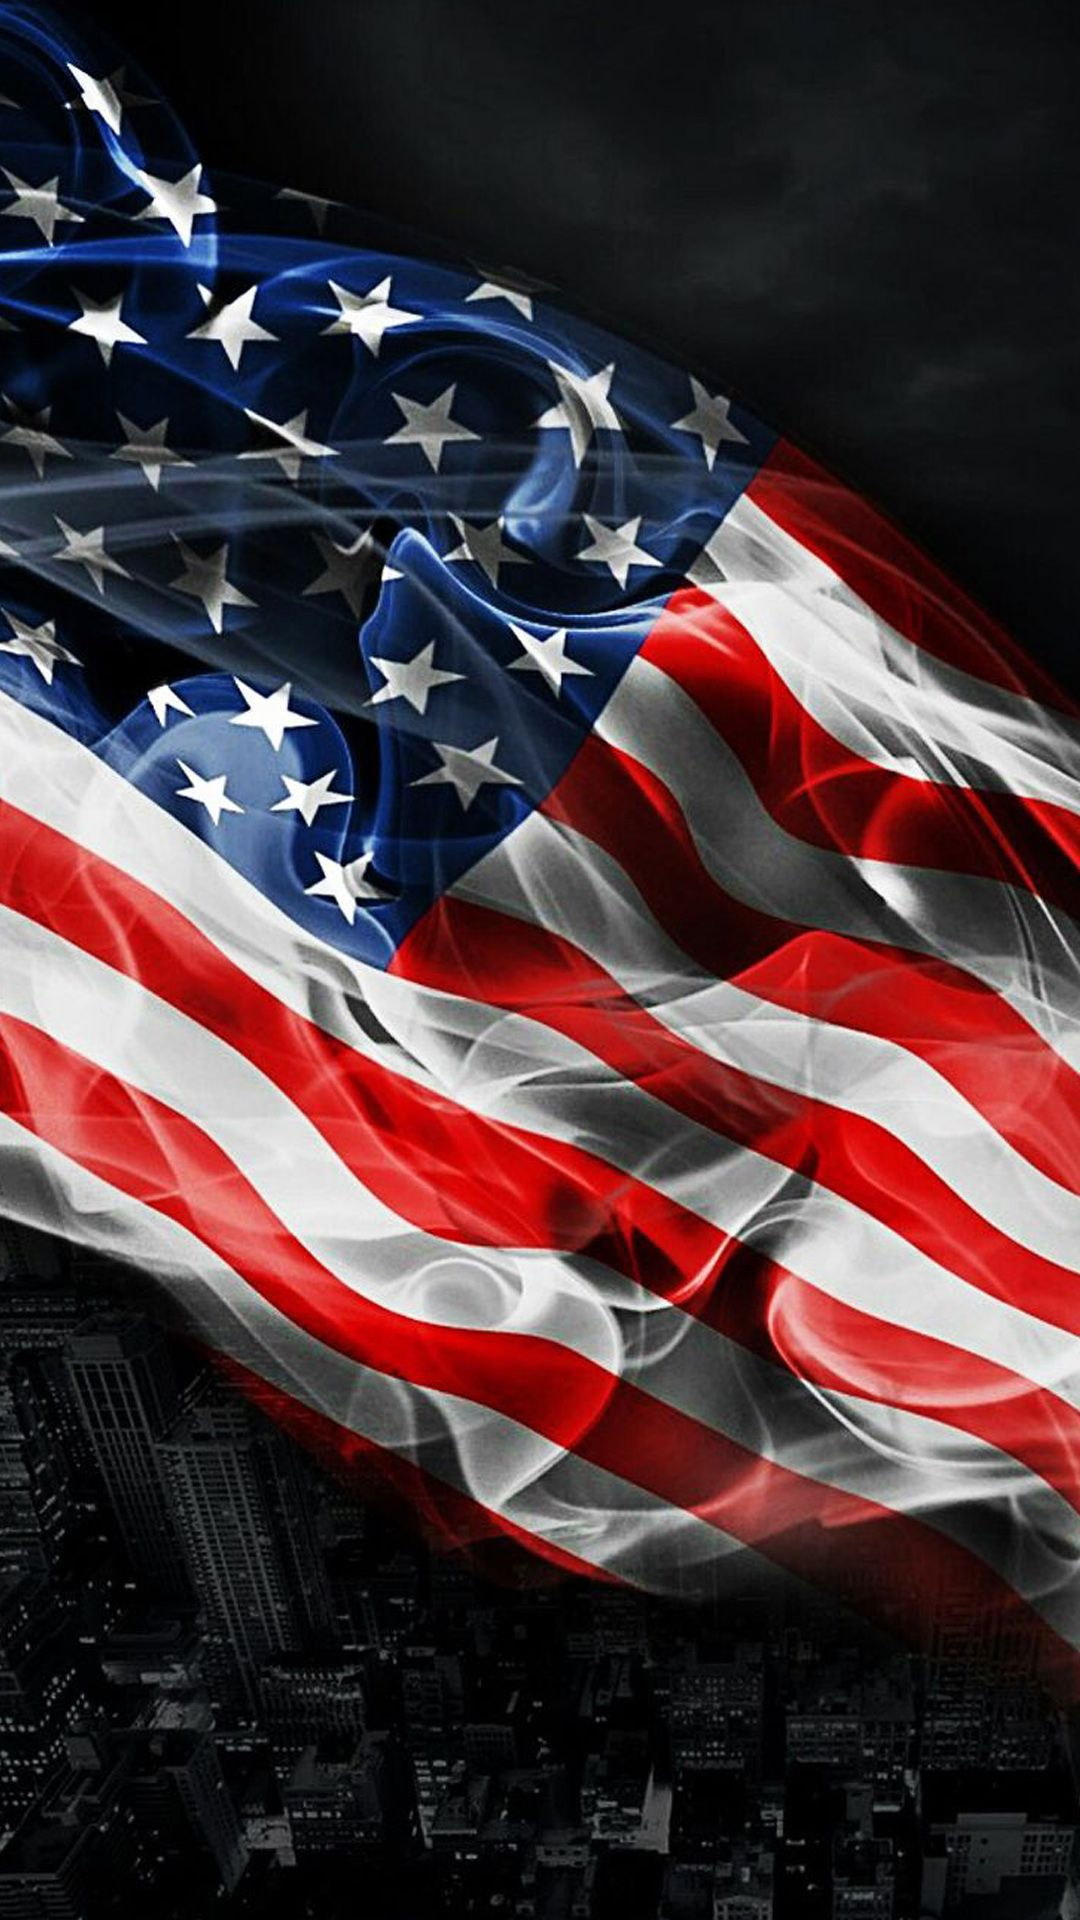 American Flag Screensavers and Wallpaper HD Wallpapers